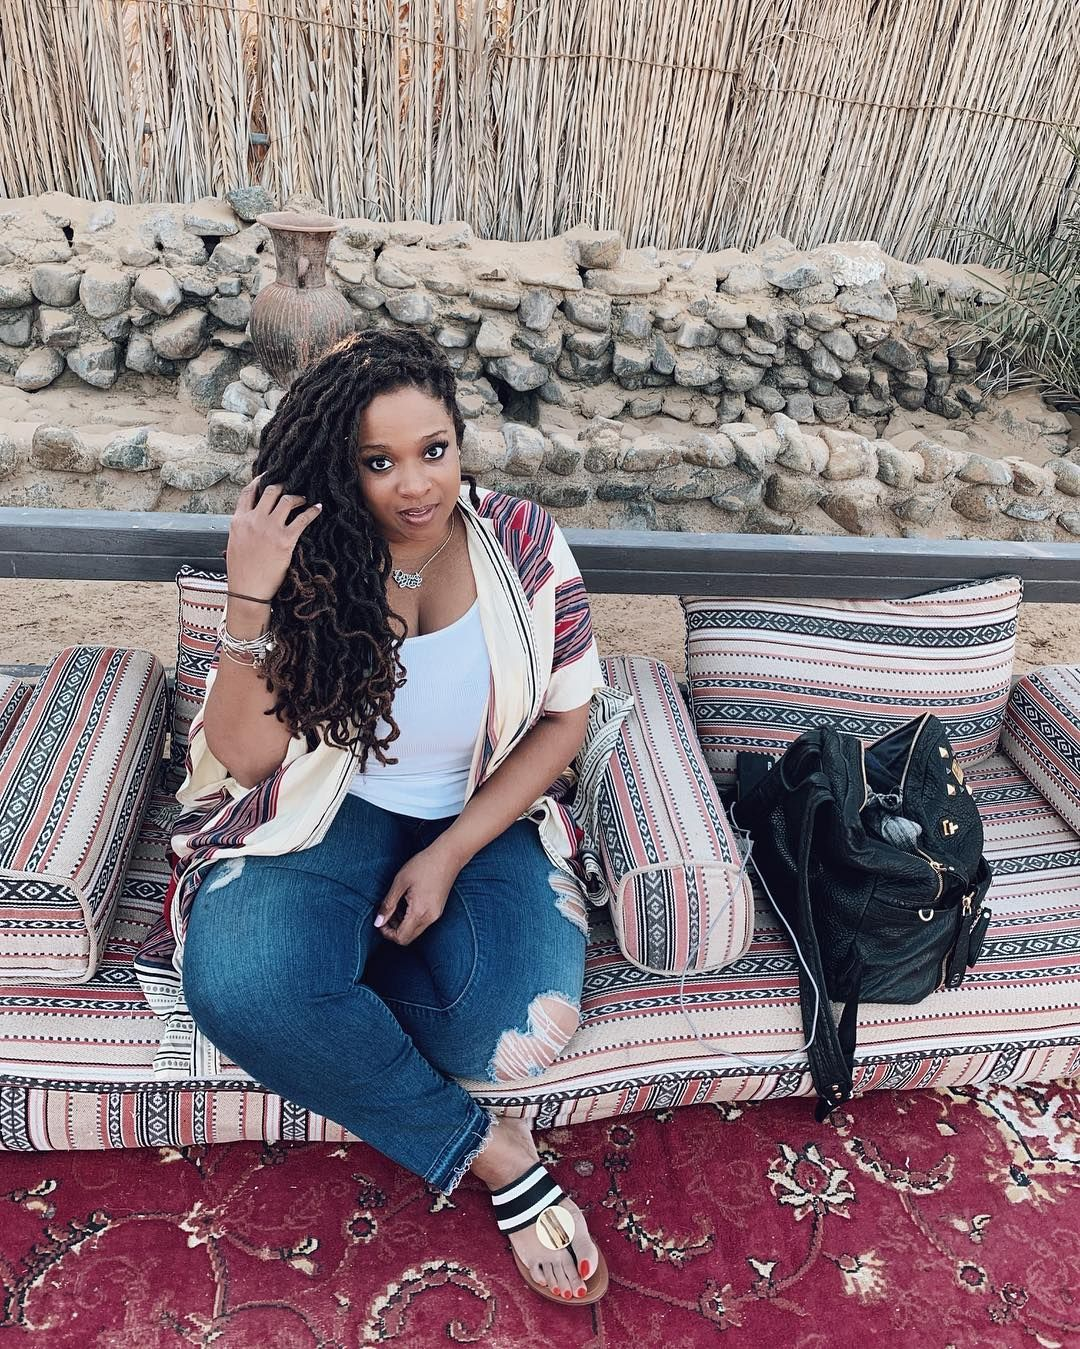 Kierra Sheard On Instagram Ashy Feet From Walking Through The Sand Lots Of Lessons Learned Here Dubai Kierra Sheard Lessons Learned Women